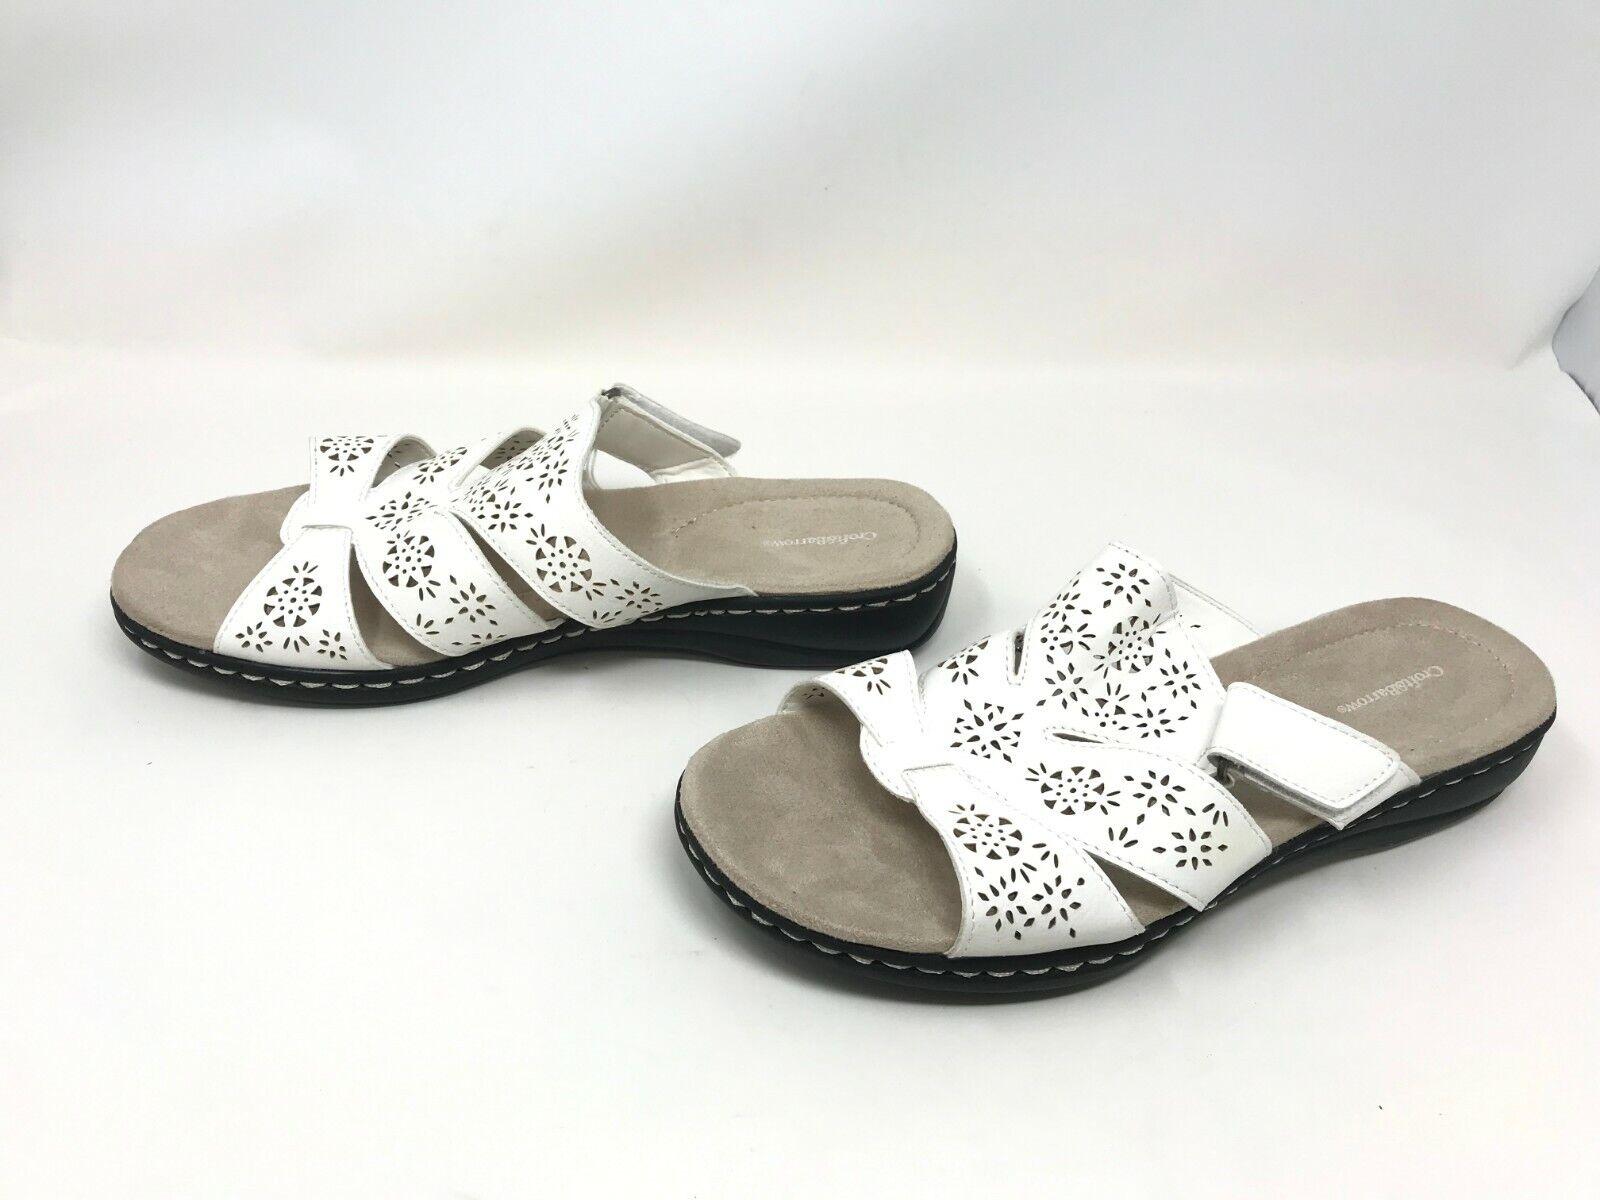 Womens Croft & Barrow (66551) Poppins White Sandals  (401K-L)